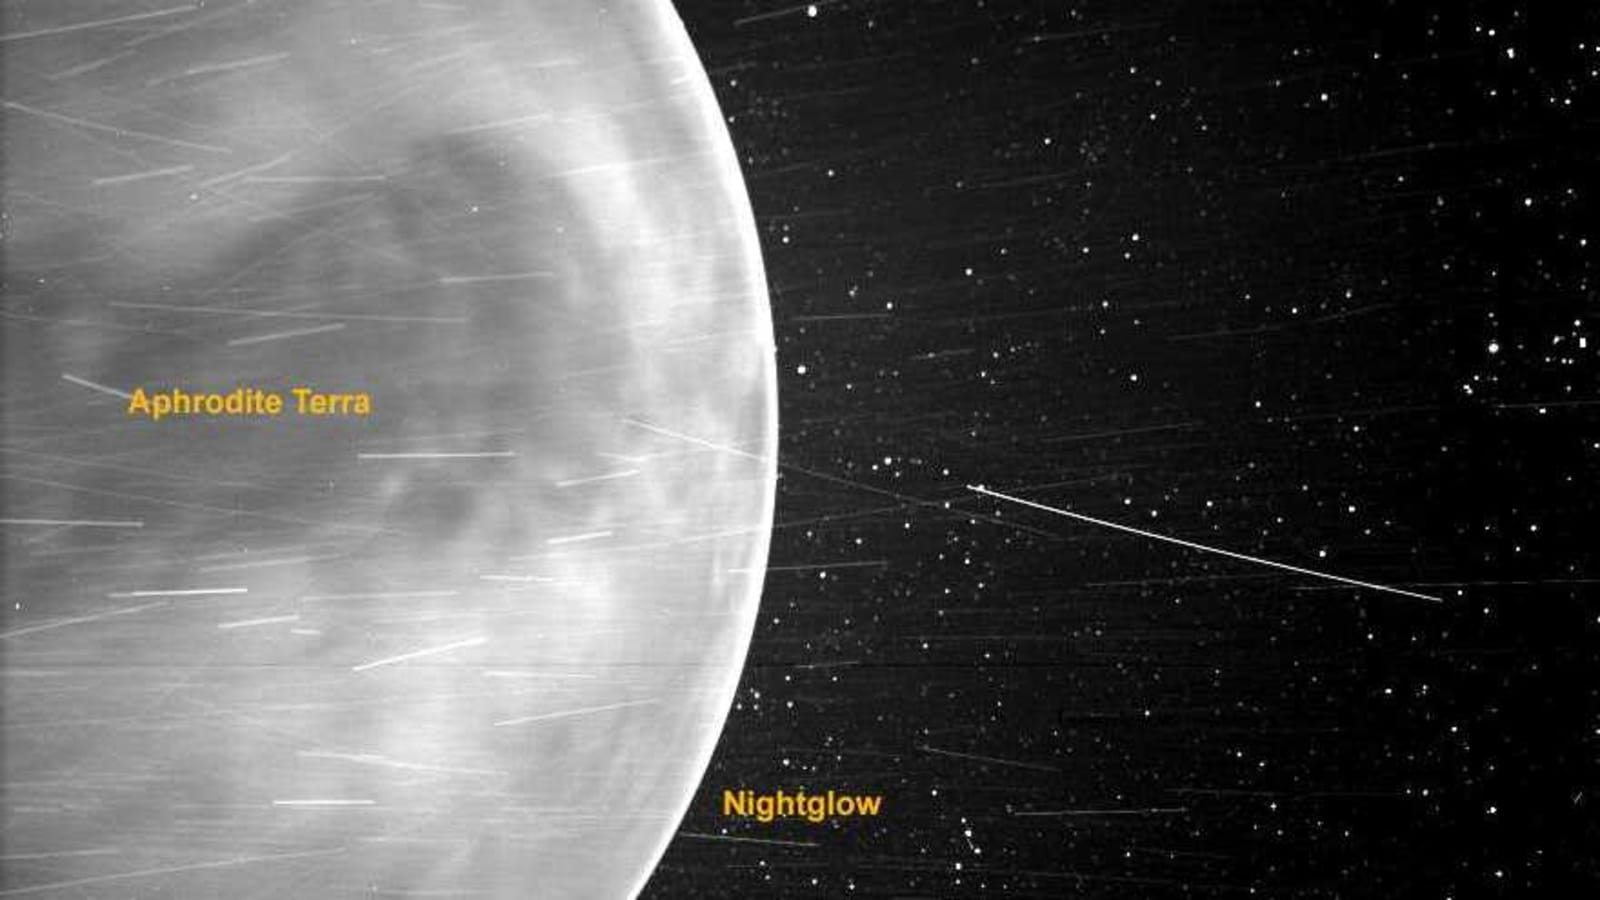 Nasa's solar probe sends stunning image of Venus and its terrain - Hindustan Times